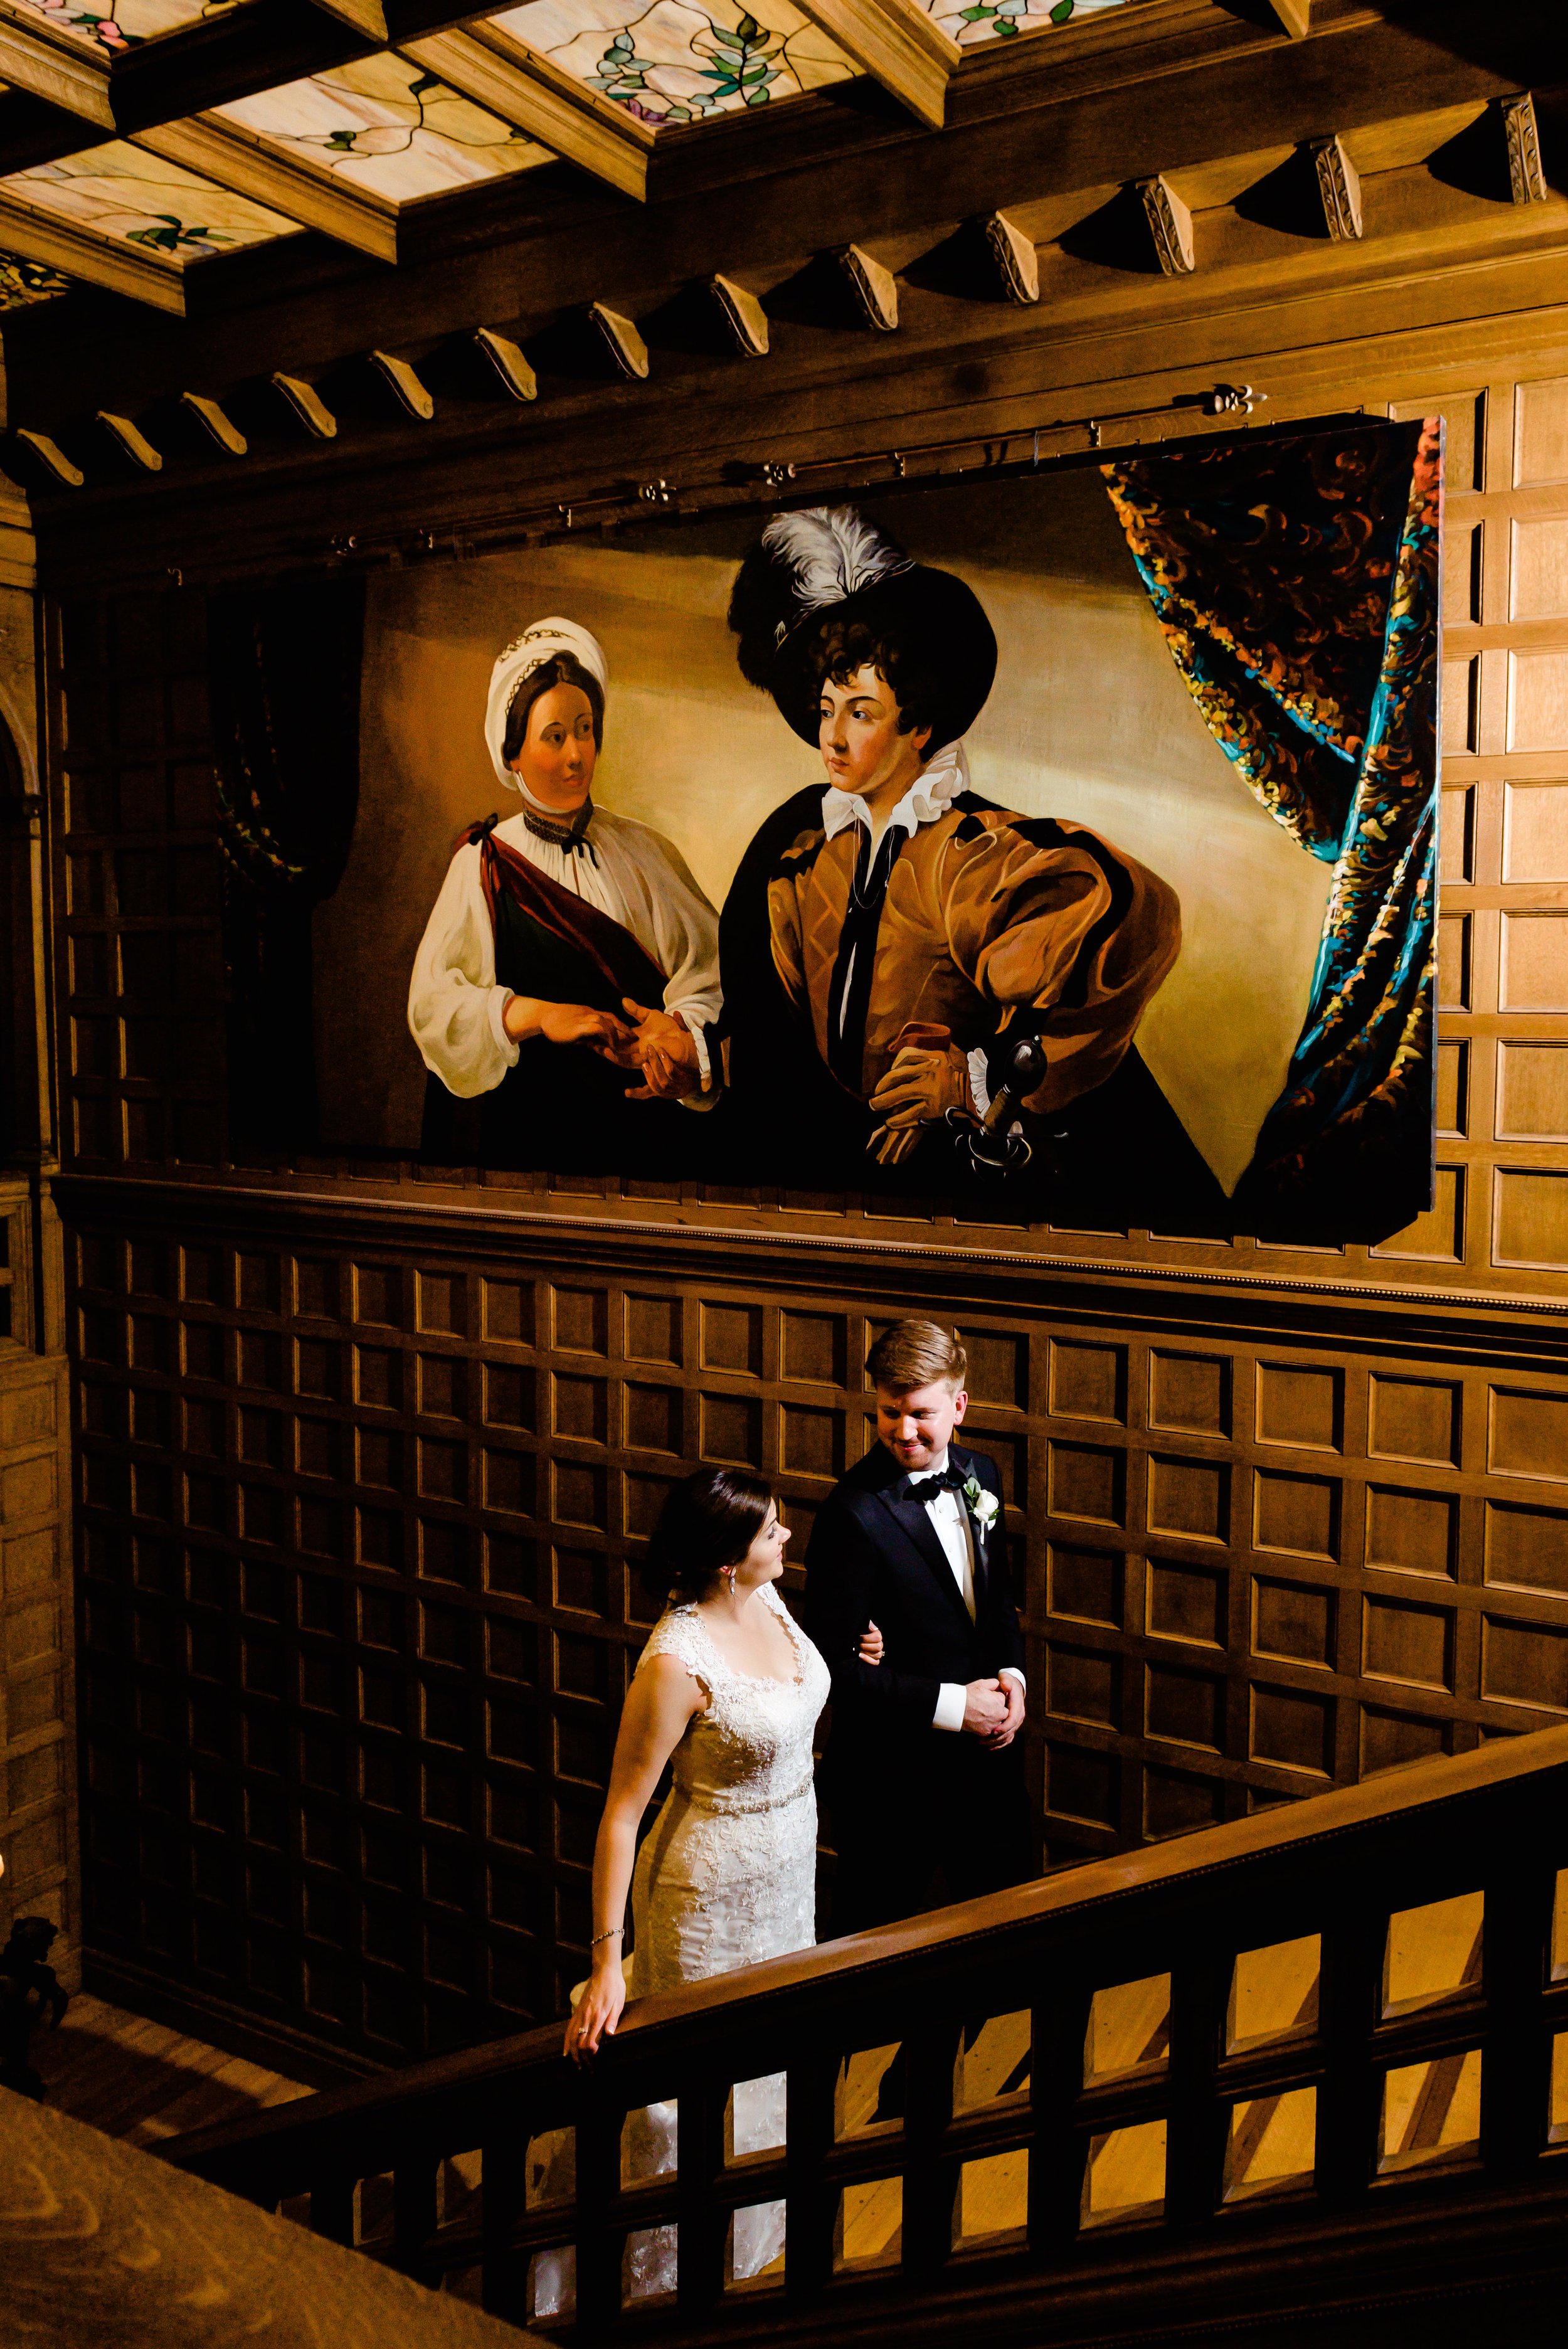 Van Dusen Wedding Photos - Historic Mansion Wedding - Bride and Groom on Staircase - Creative Wedding Photographer in Minneapolis MN